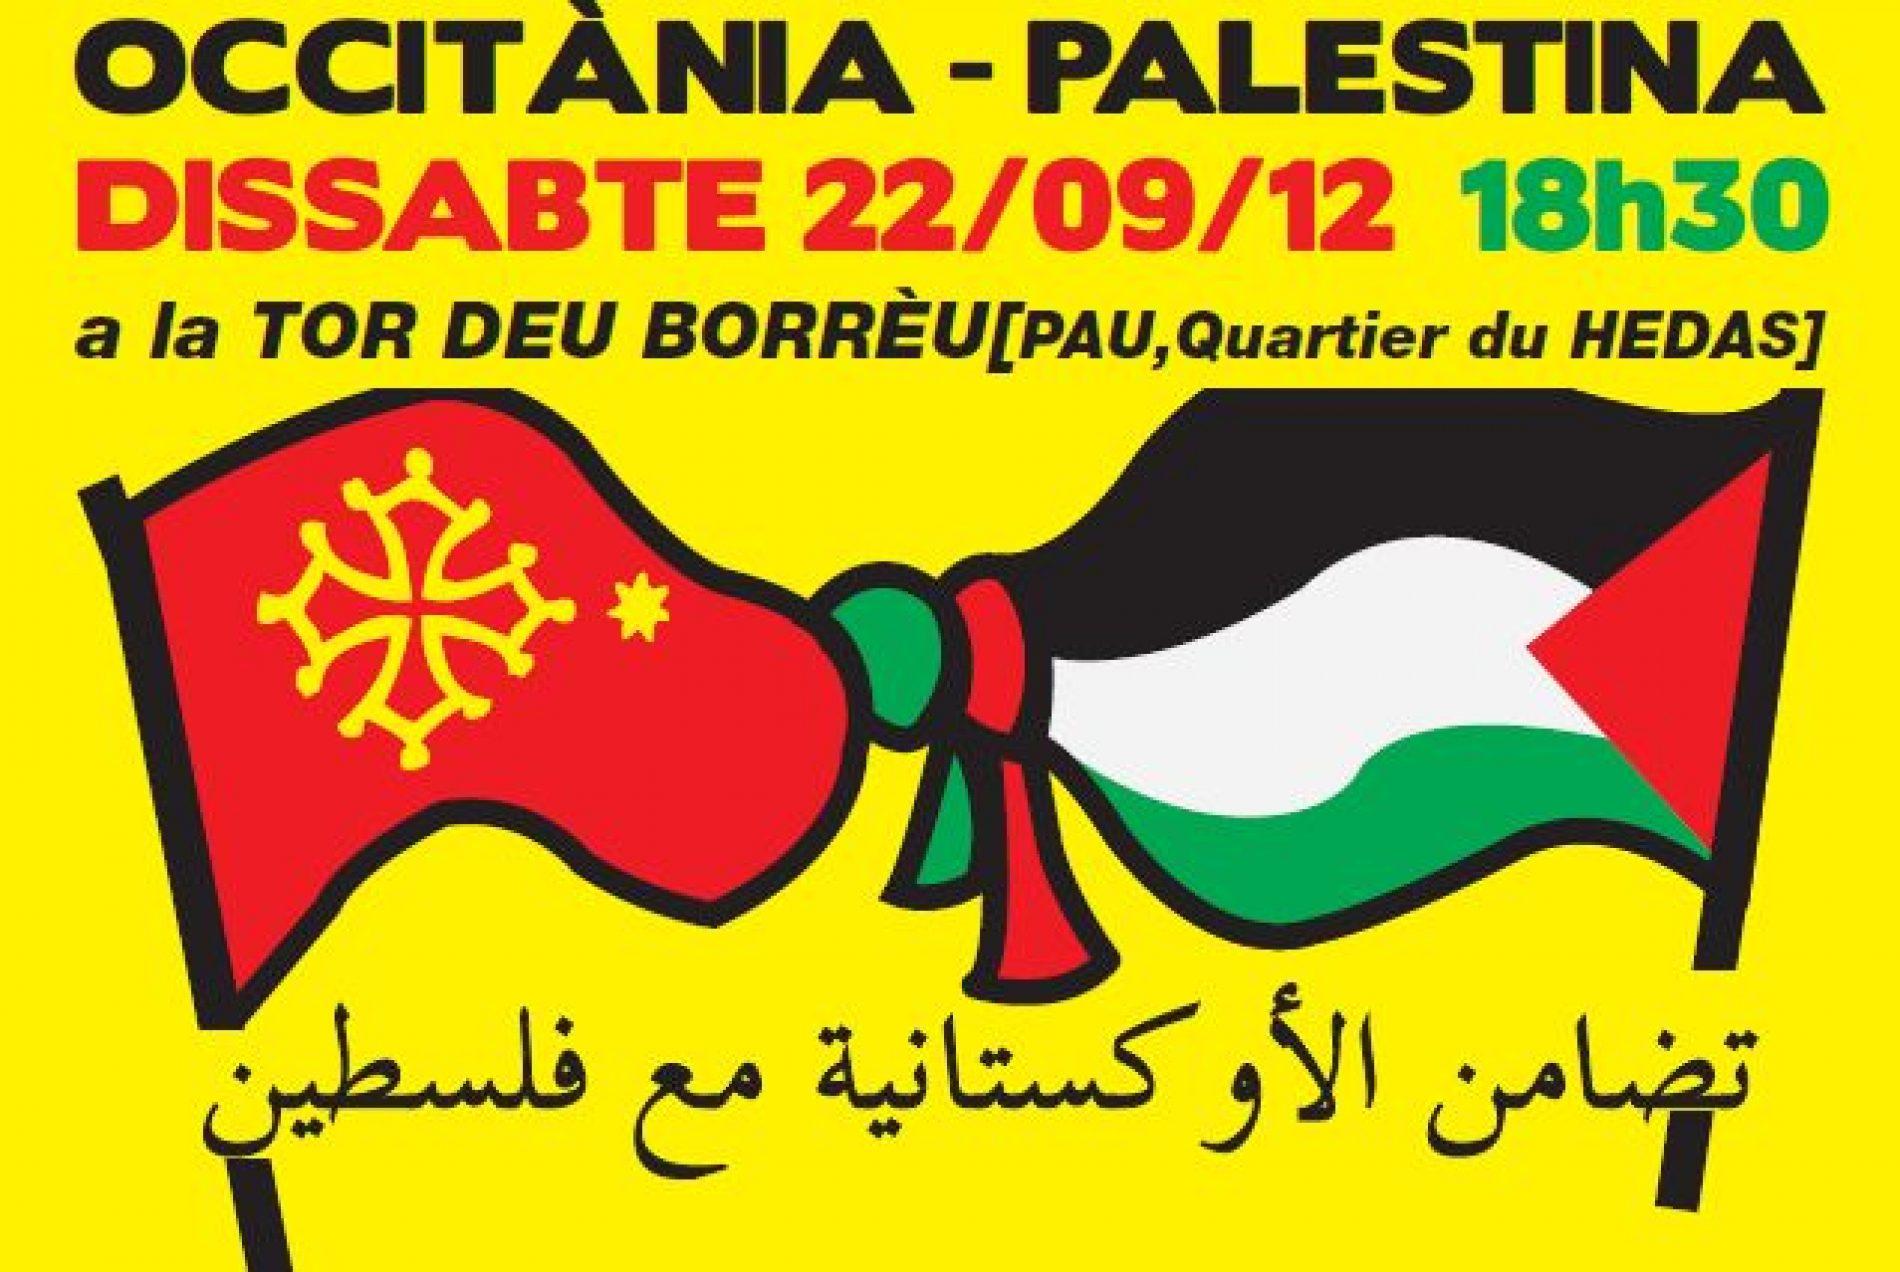 Soirée Occitanie | Palestine à Pau